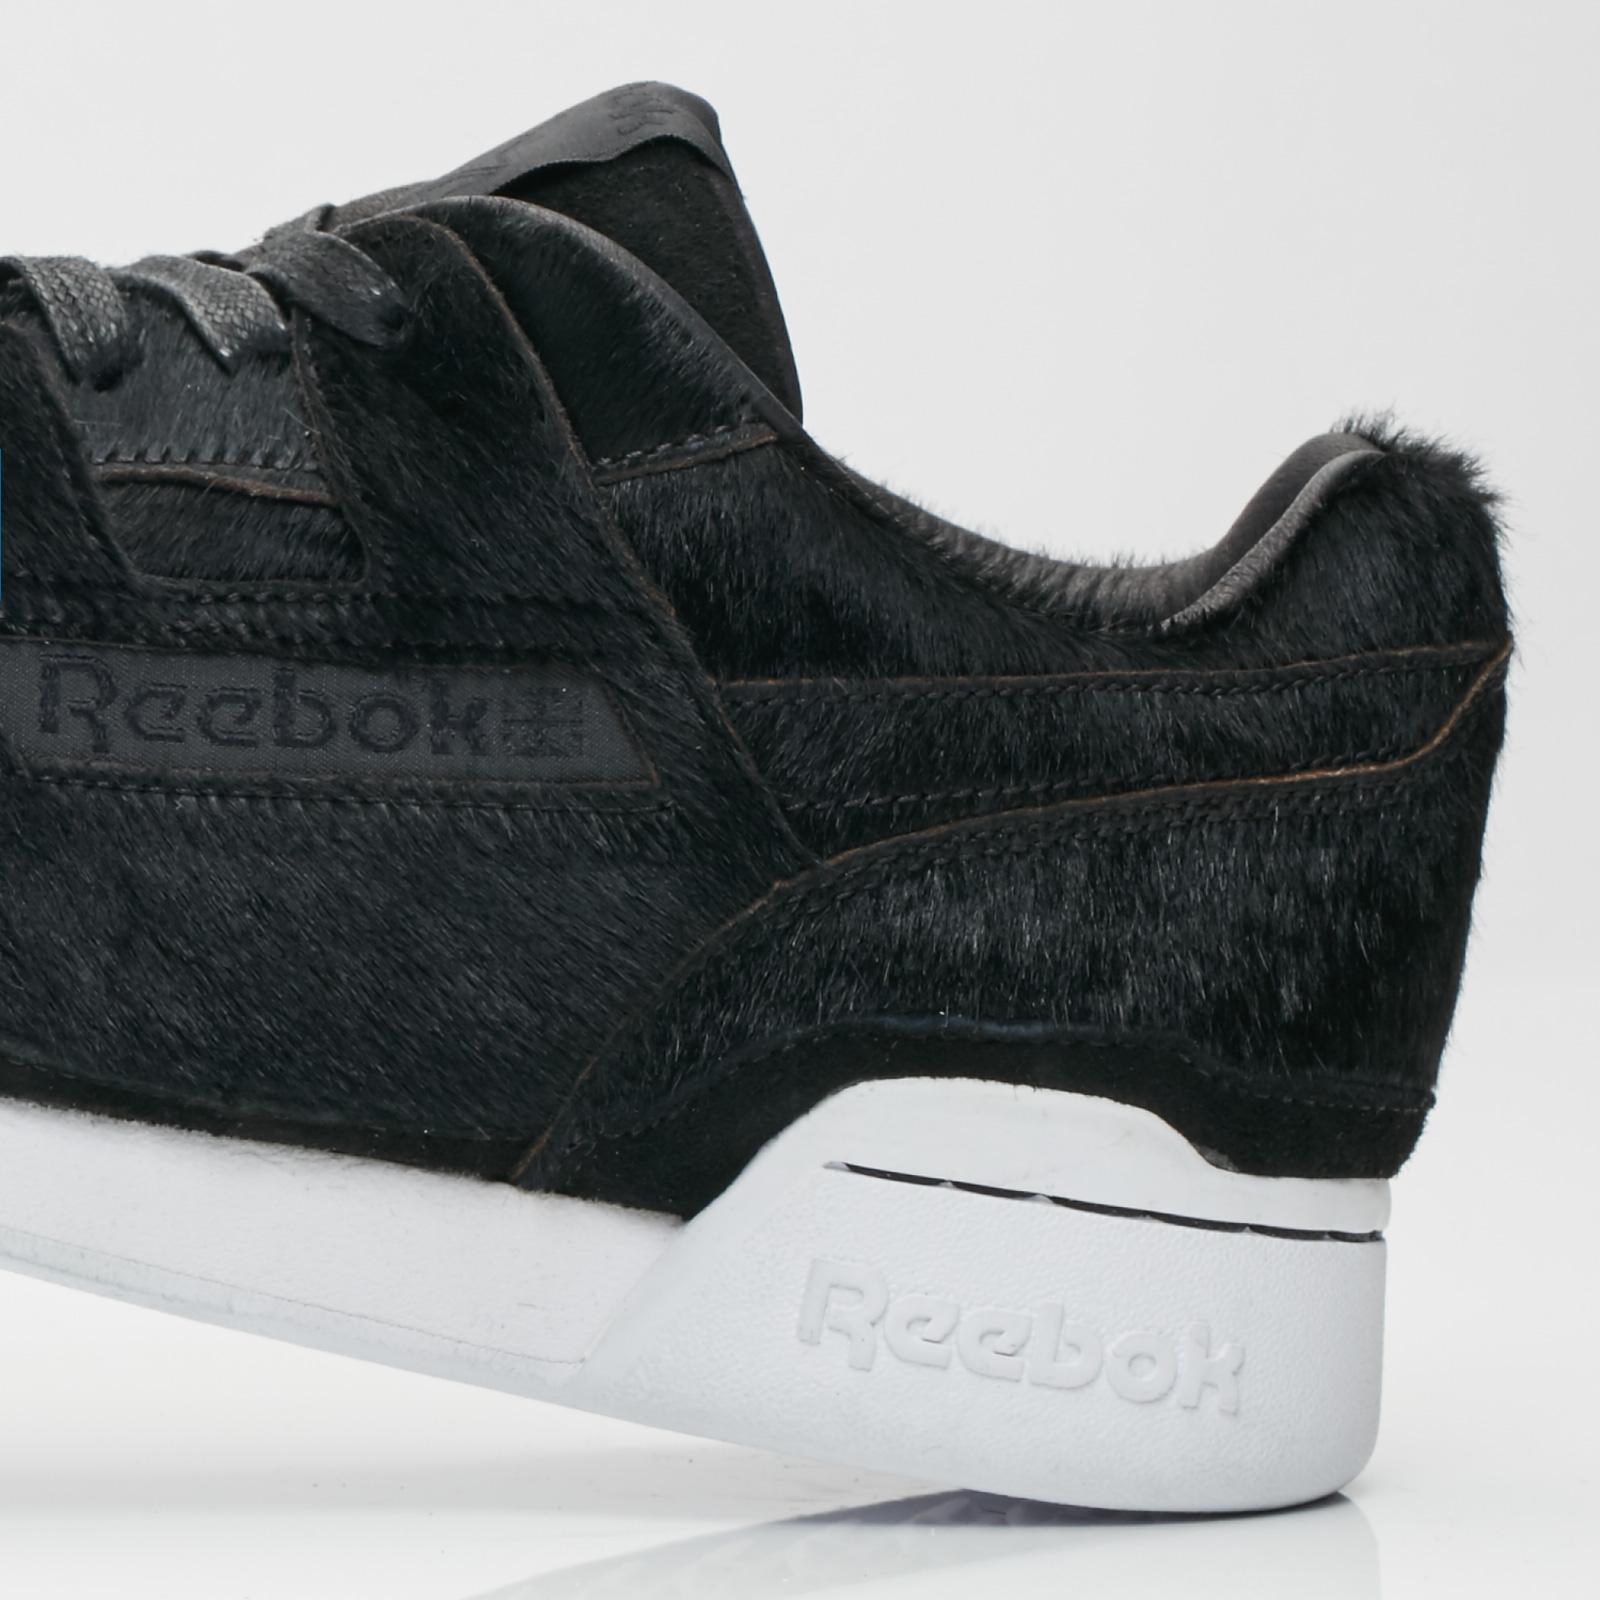 Reebok Workout Lo Plus x Head Porter - Cn2033 - Sneakersnstuff ... d0c8f962f